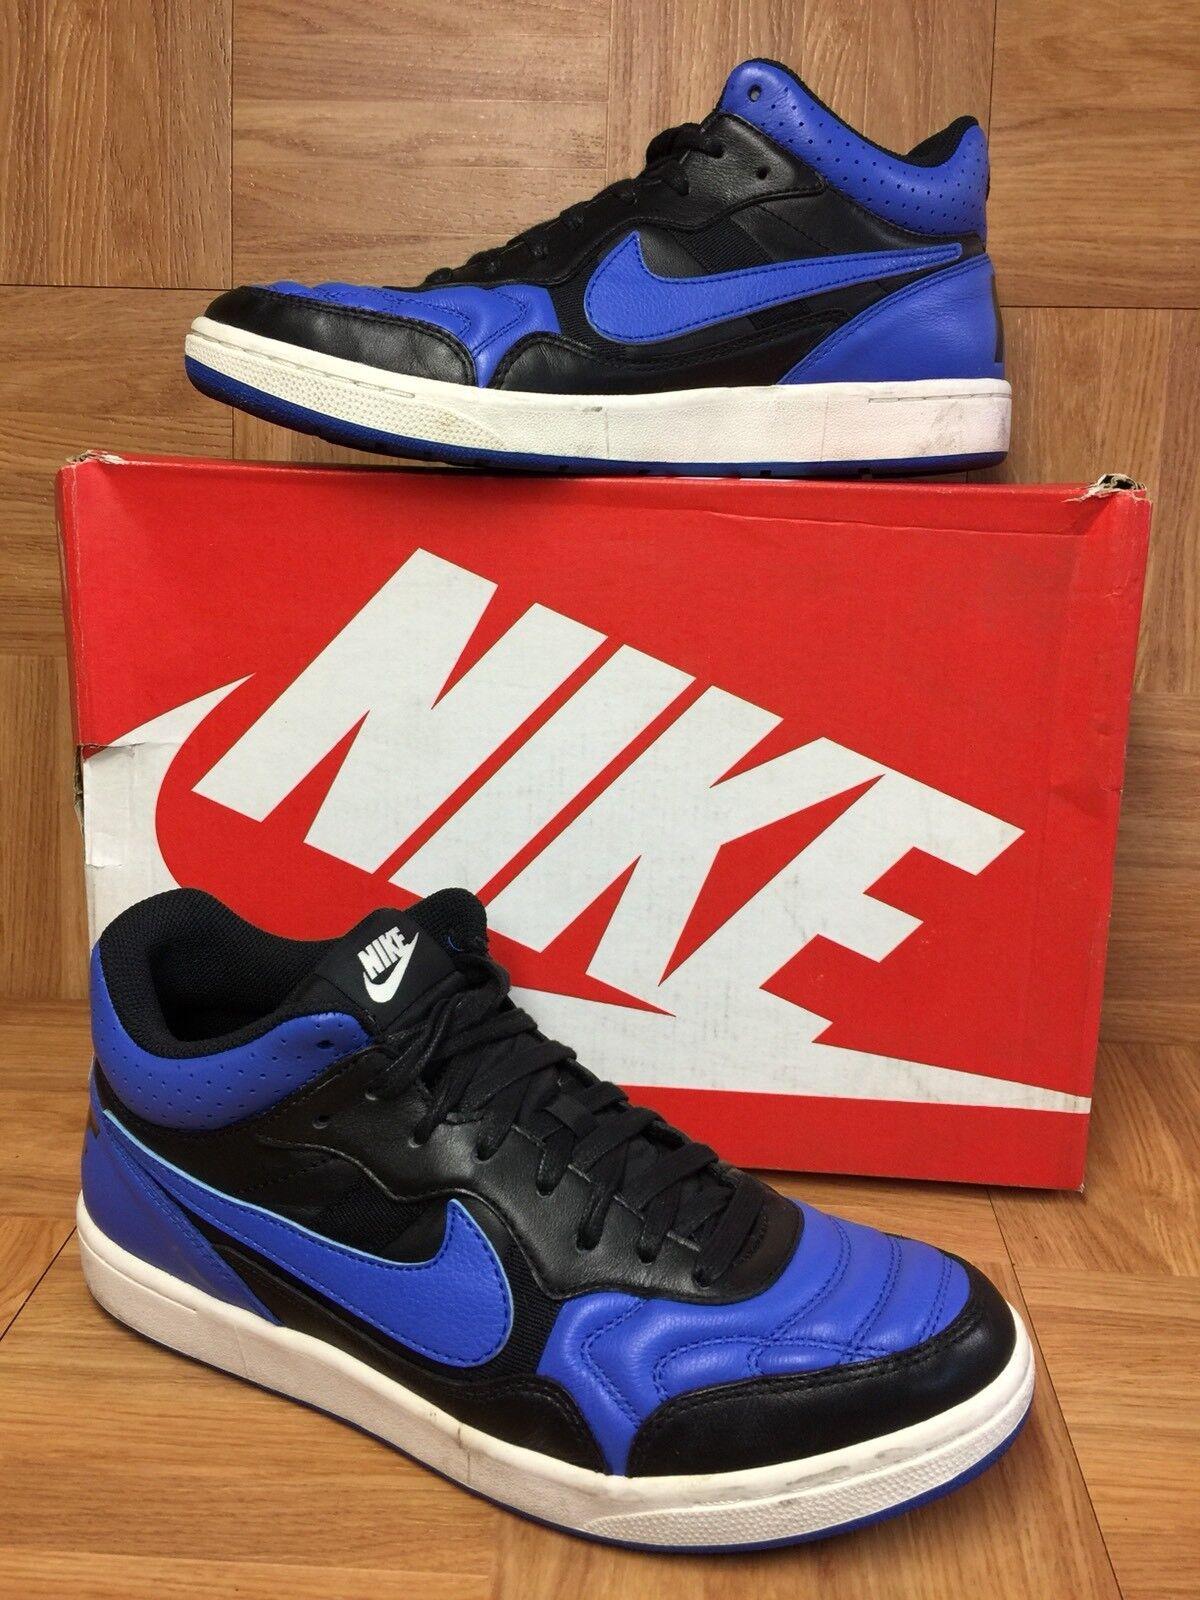 RARE  Nike Tiempo '94 Mid QS Black Royal Blue Leather Ivory 8 Men's 641147-041